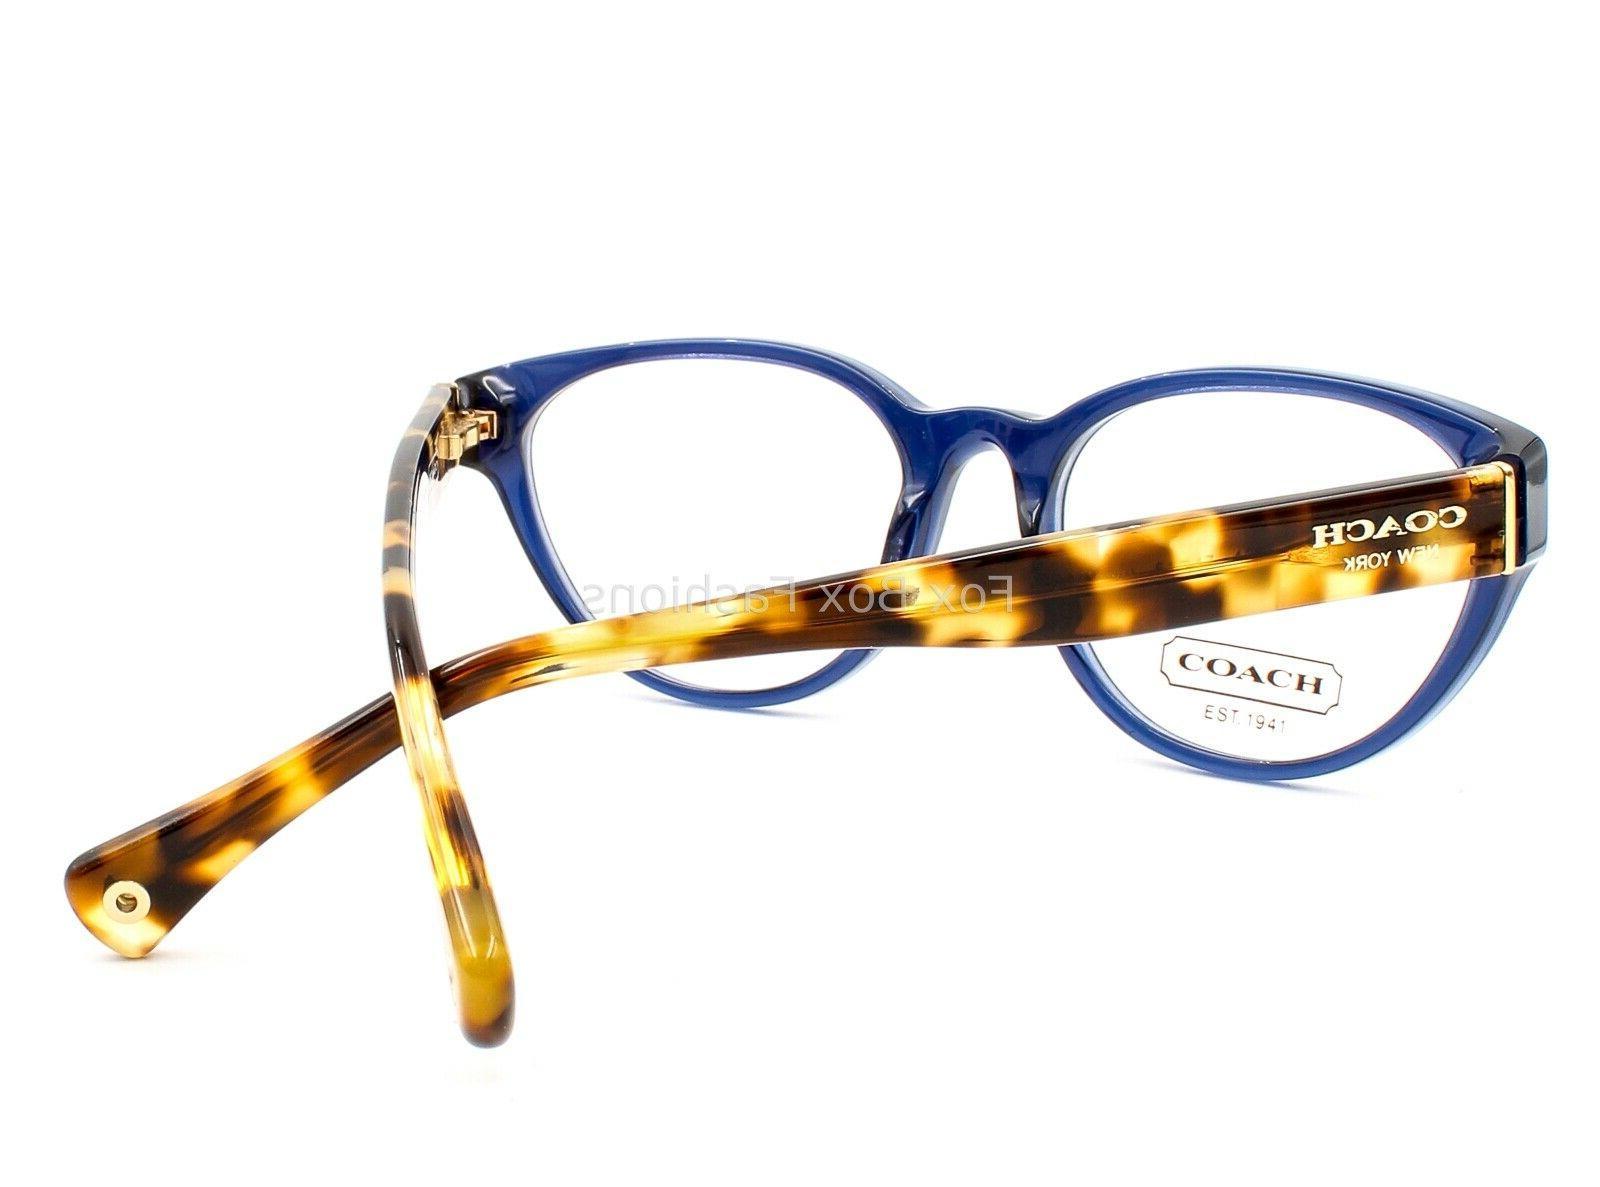 COACH 6039 5110 Baily Frame Glasses Navy & 51-17-135